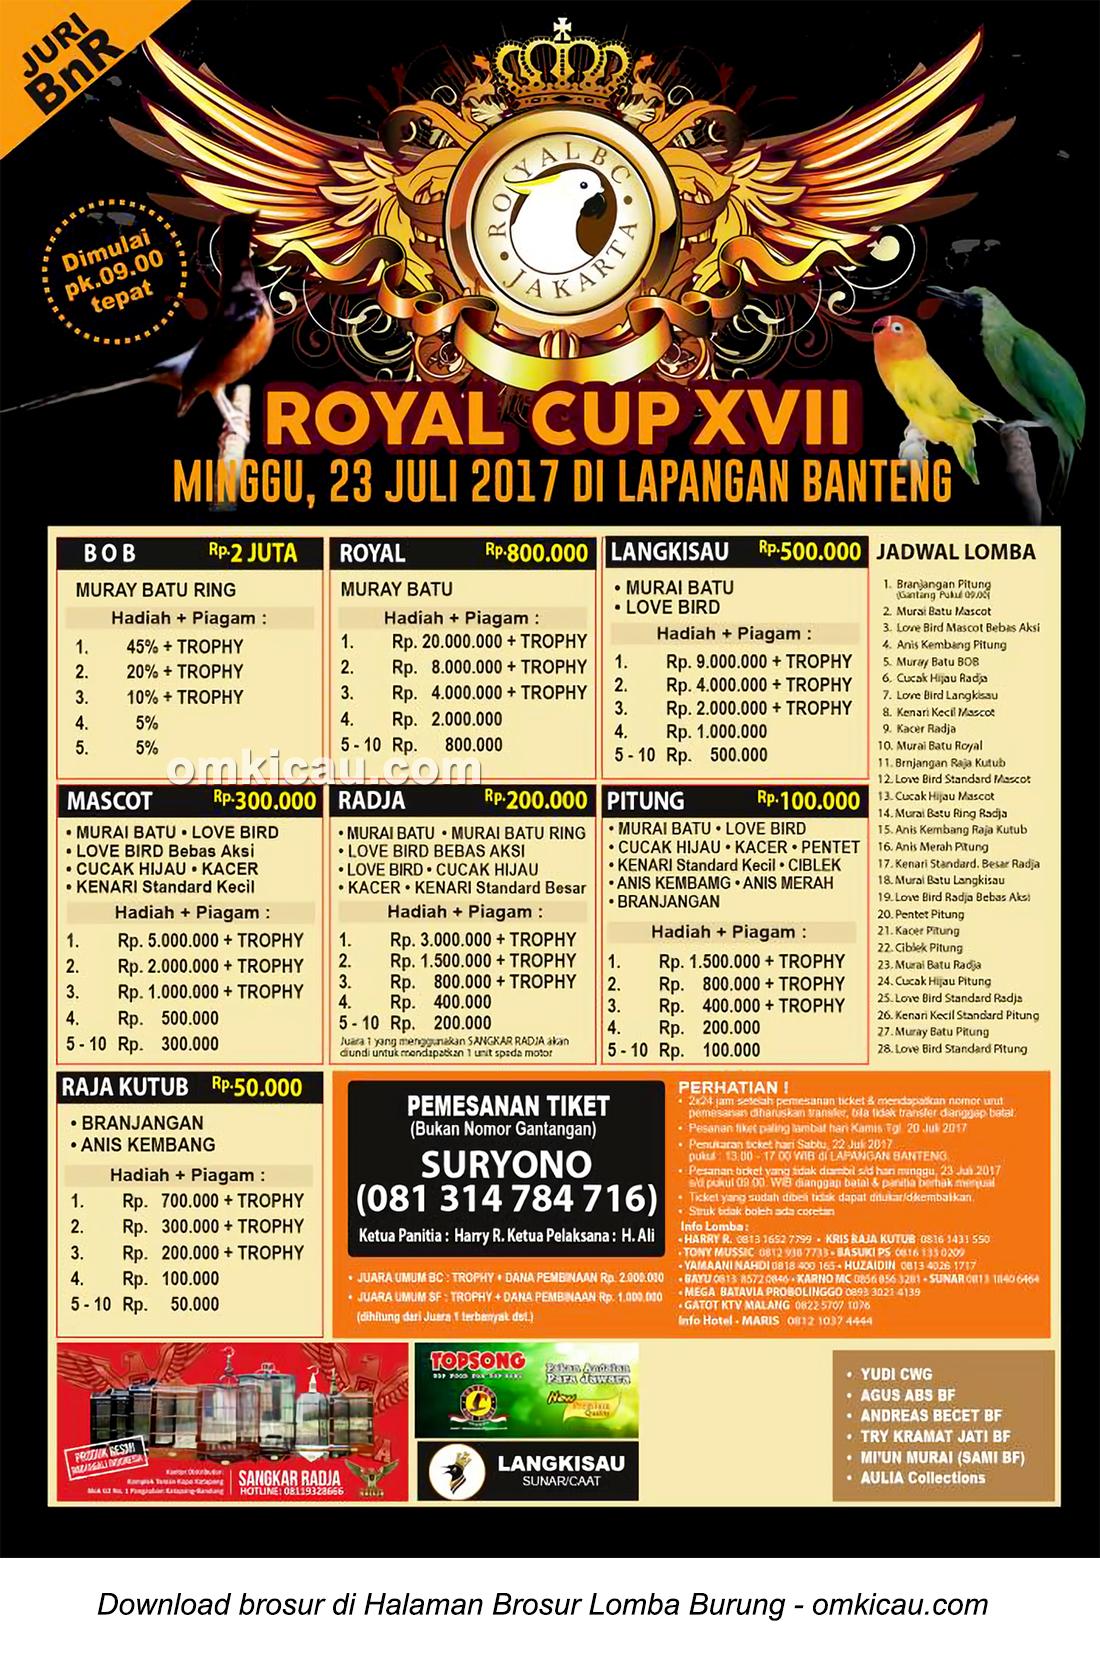 Brosur Lomba Burung Berkicau Royal Cup XVII, Jakarta, 23 Juli 2017